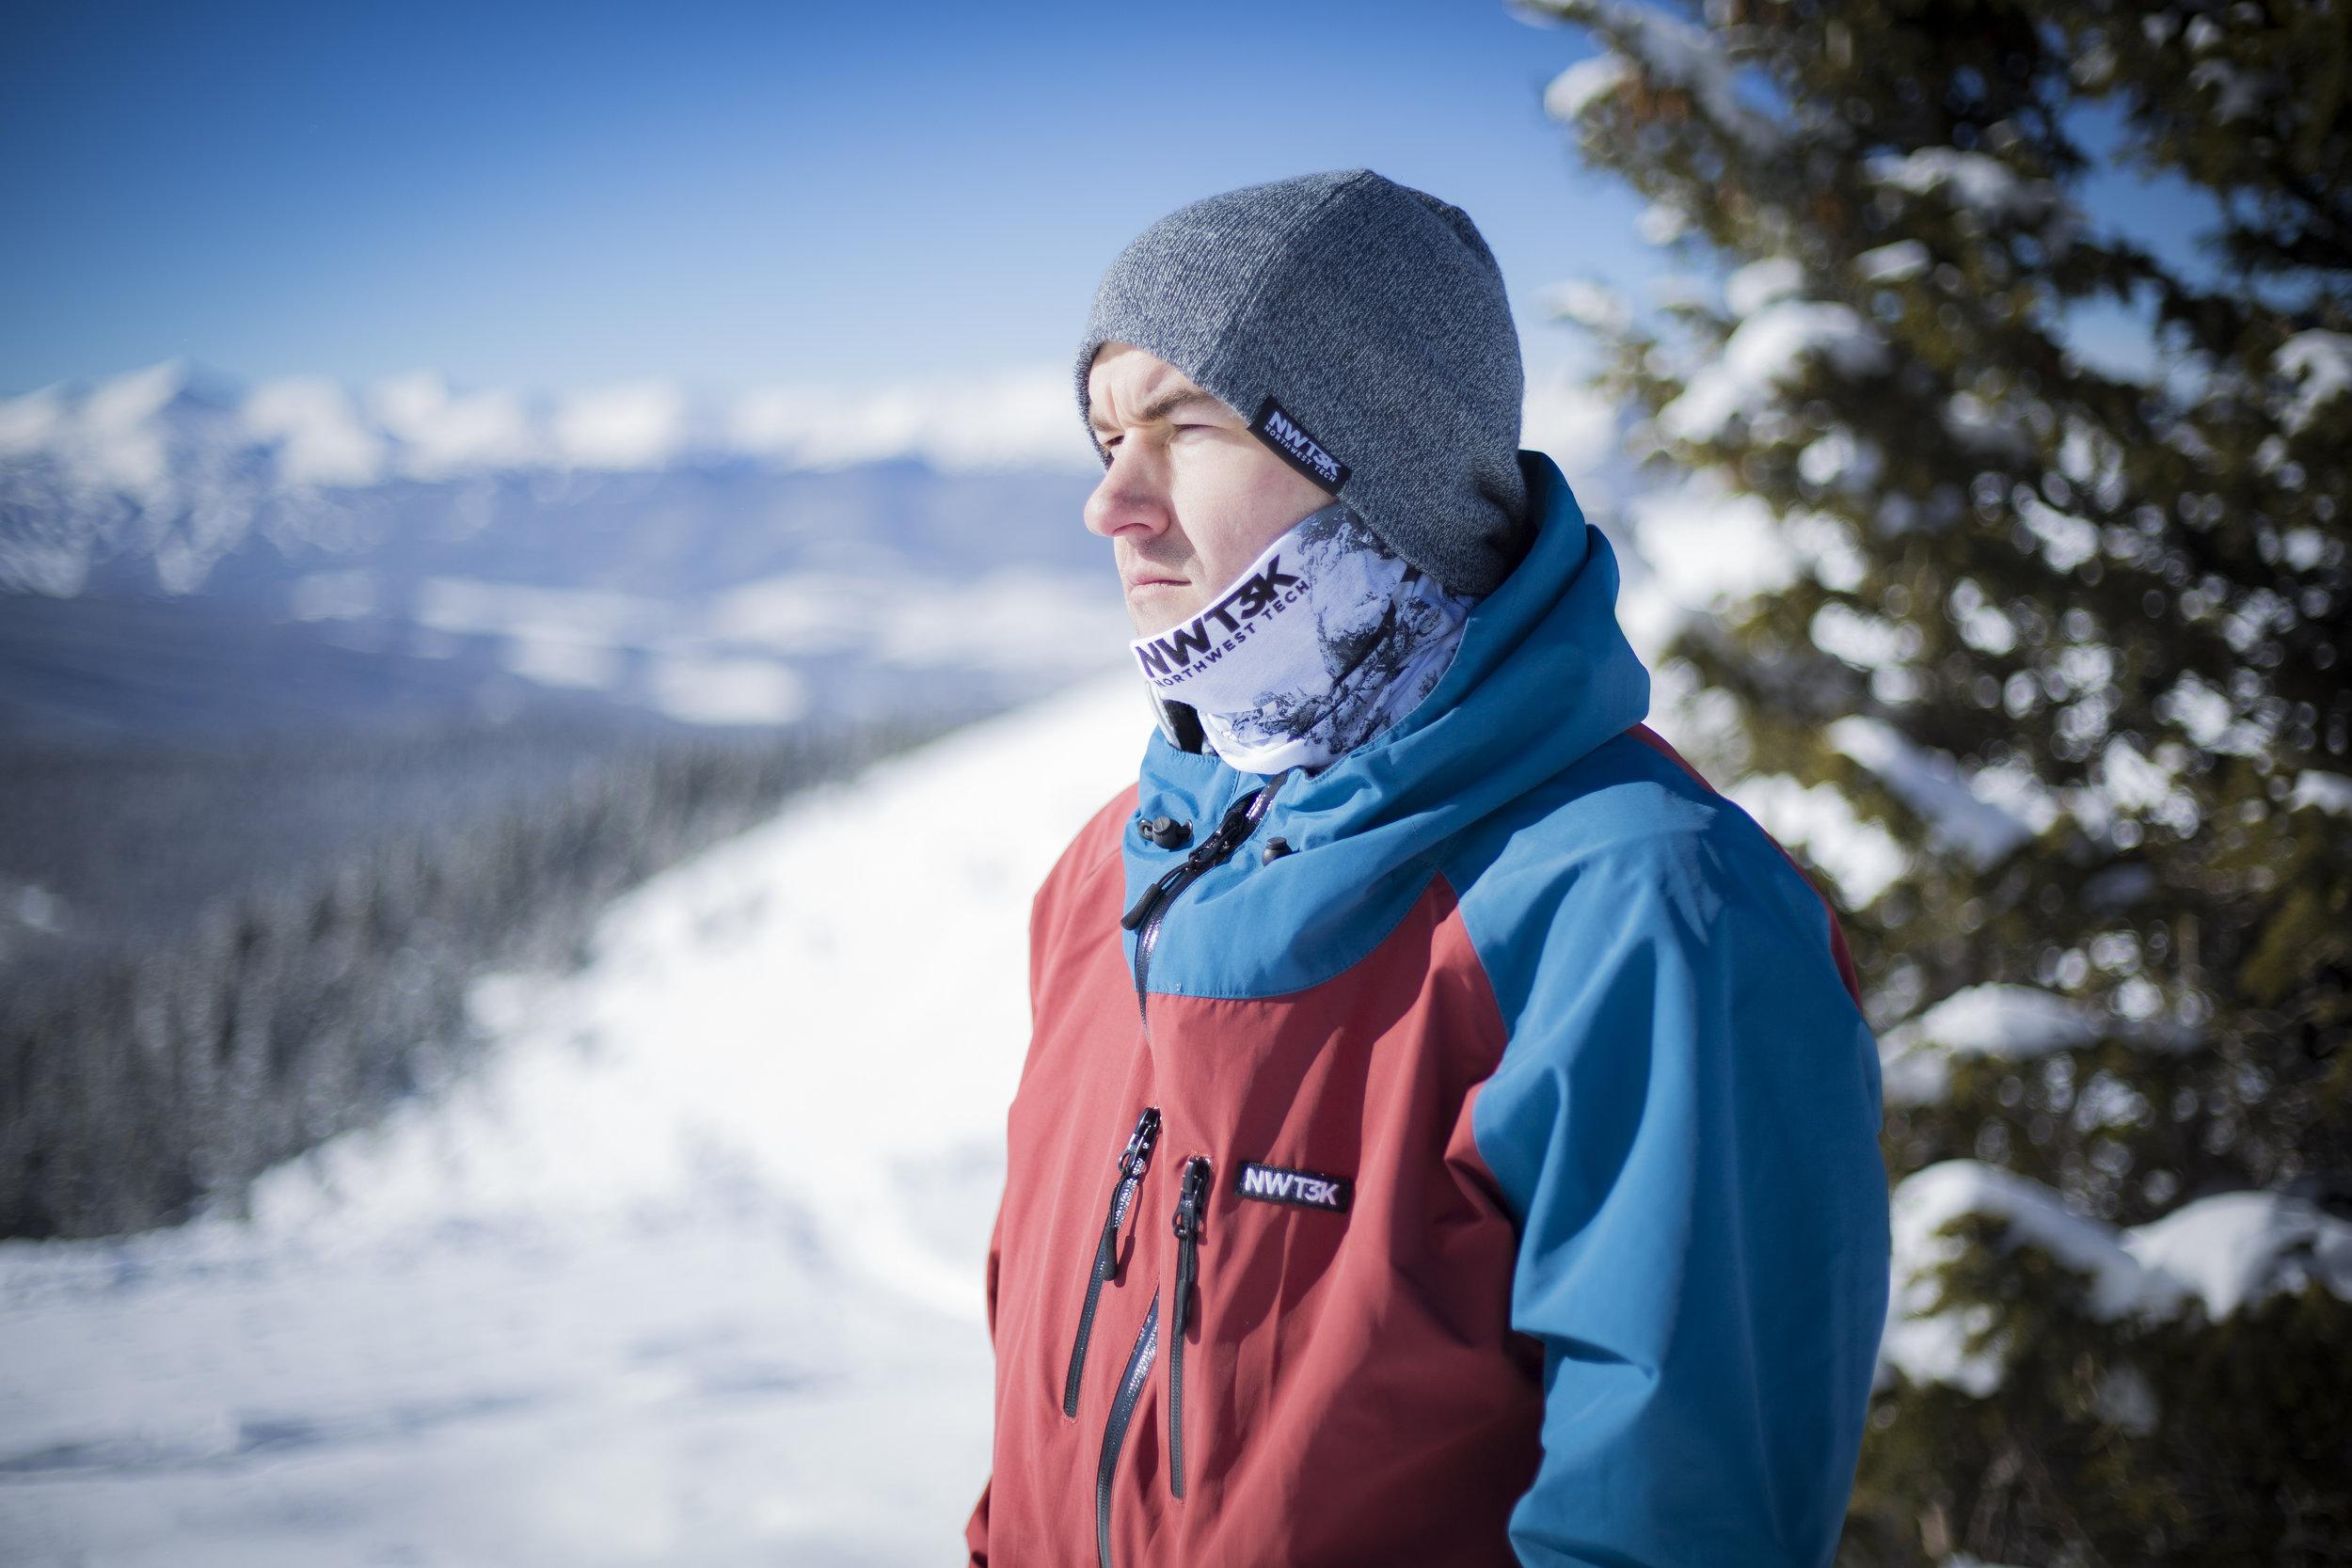 NWT3K Sponsor representation on the slopes in Keystone, Colorado.